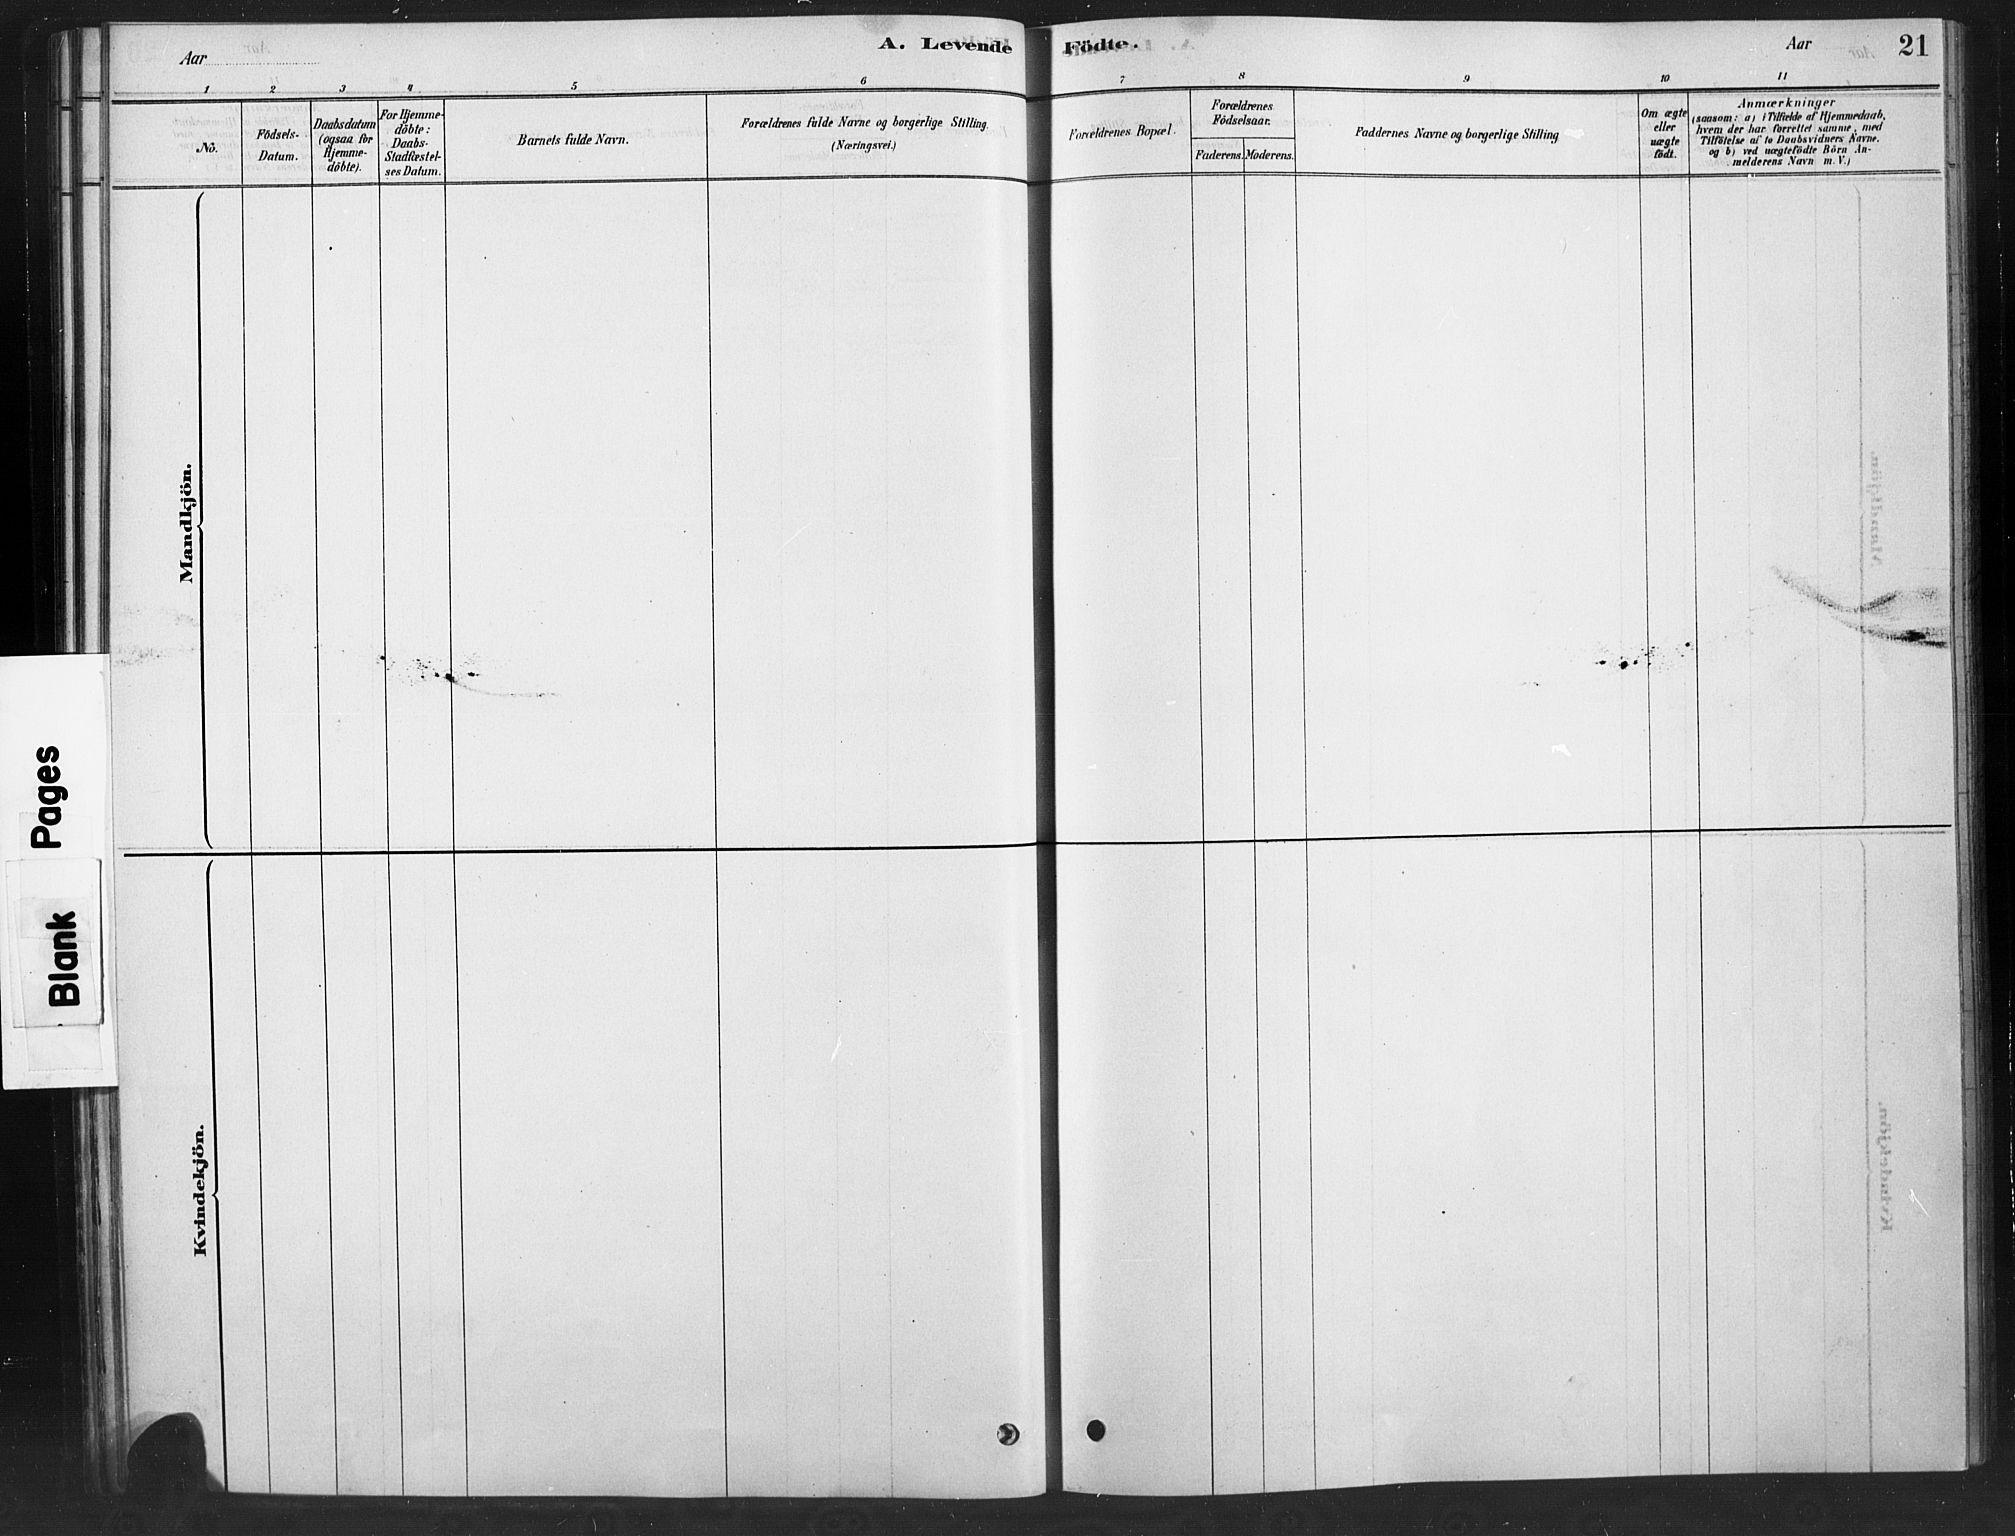 SAH, Ringebu prestekontor, Ministerialbok nr. 10, 1878-1898, s. 21